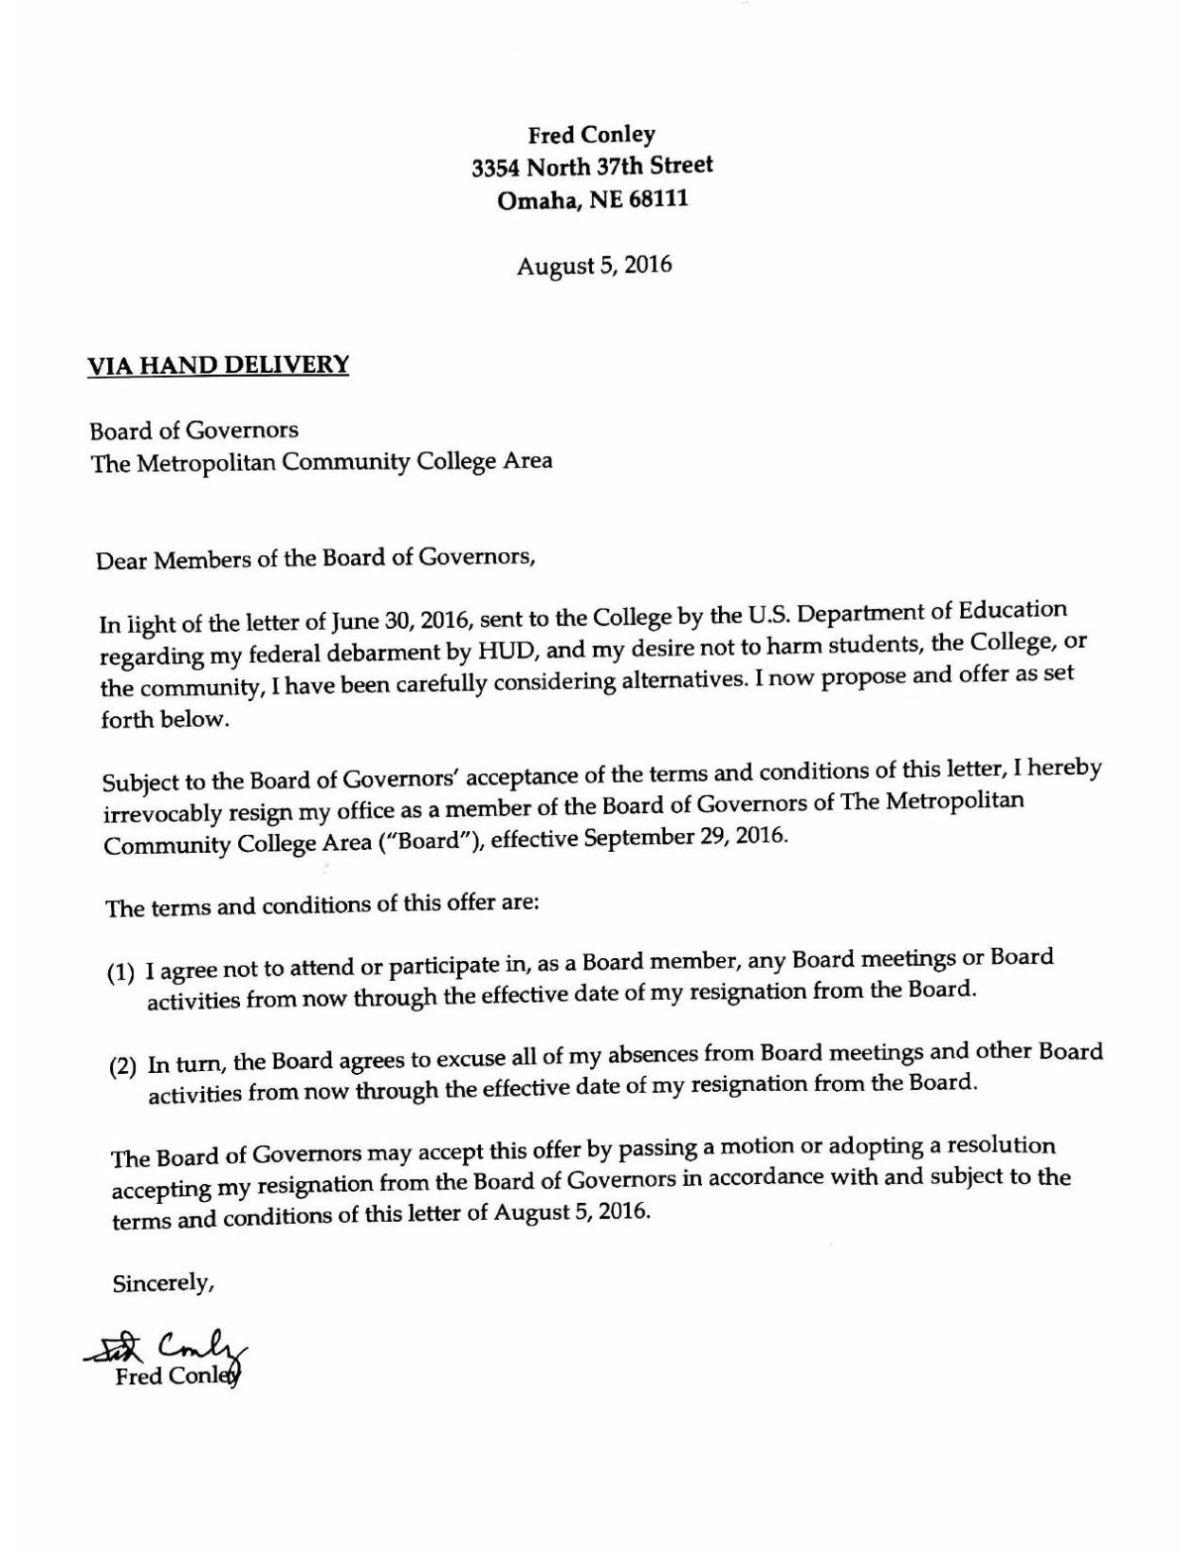 Read Fred Conley's Resignation Letter PDF Omaha Com